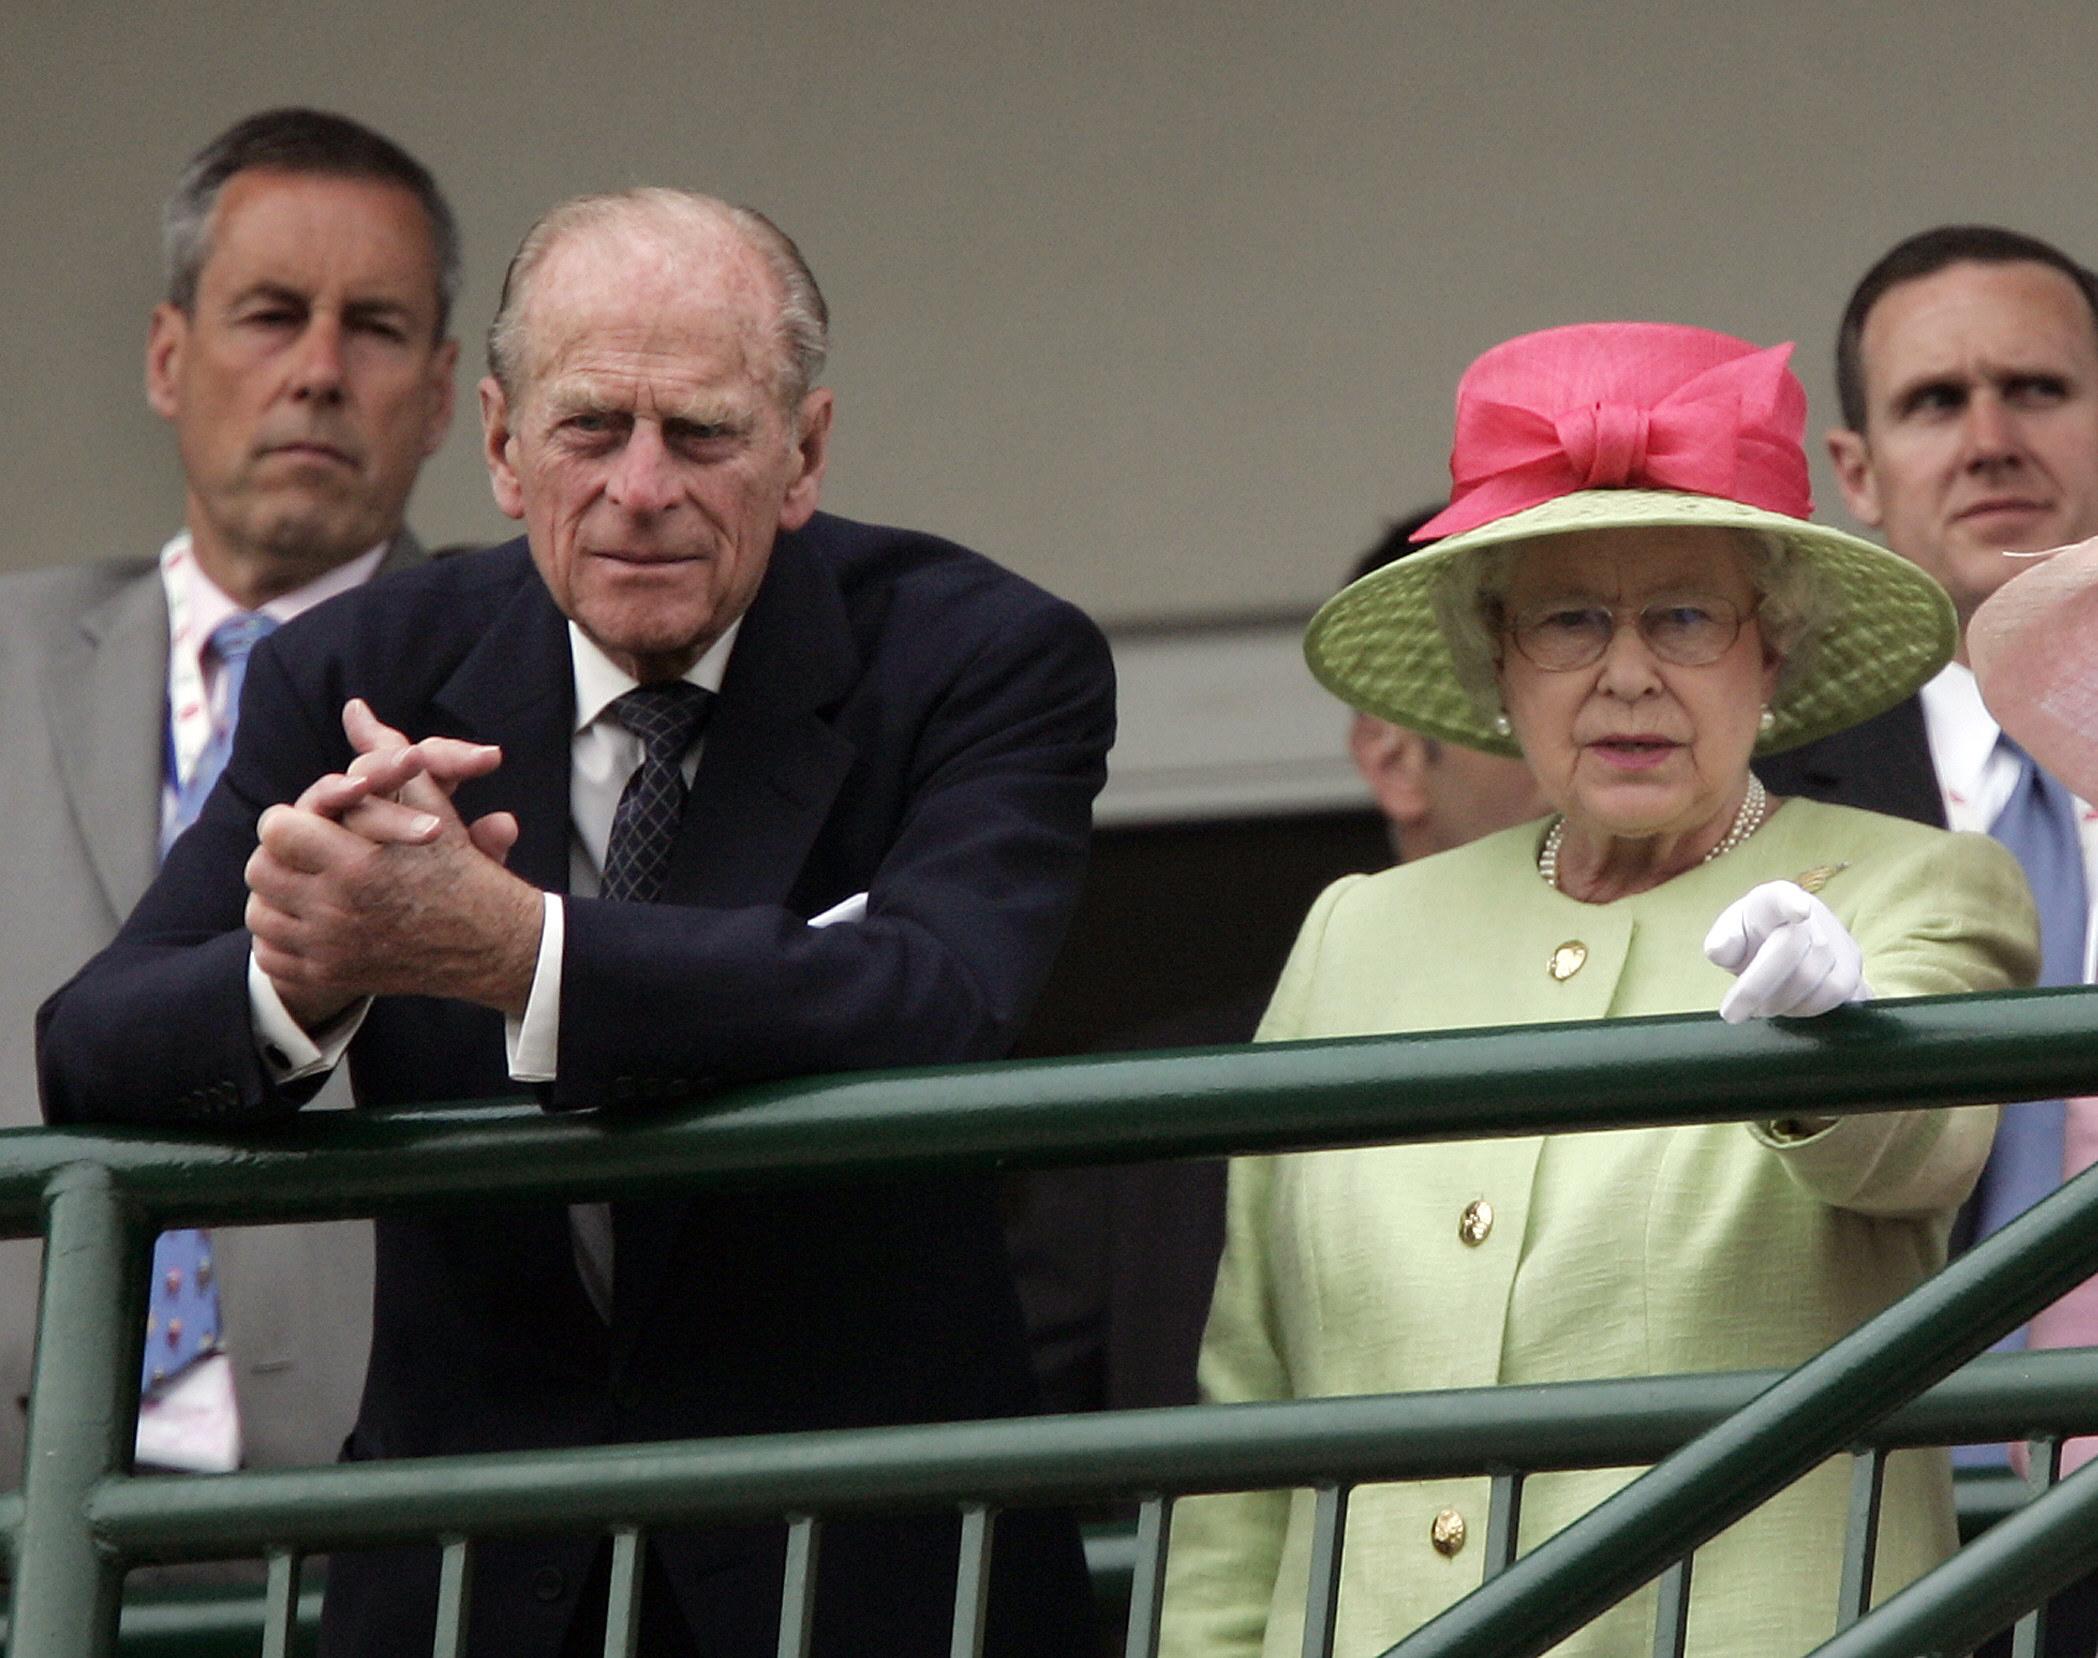 Prince Philip standing with Queen Elizabeth